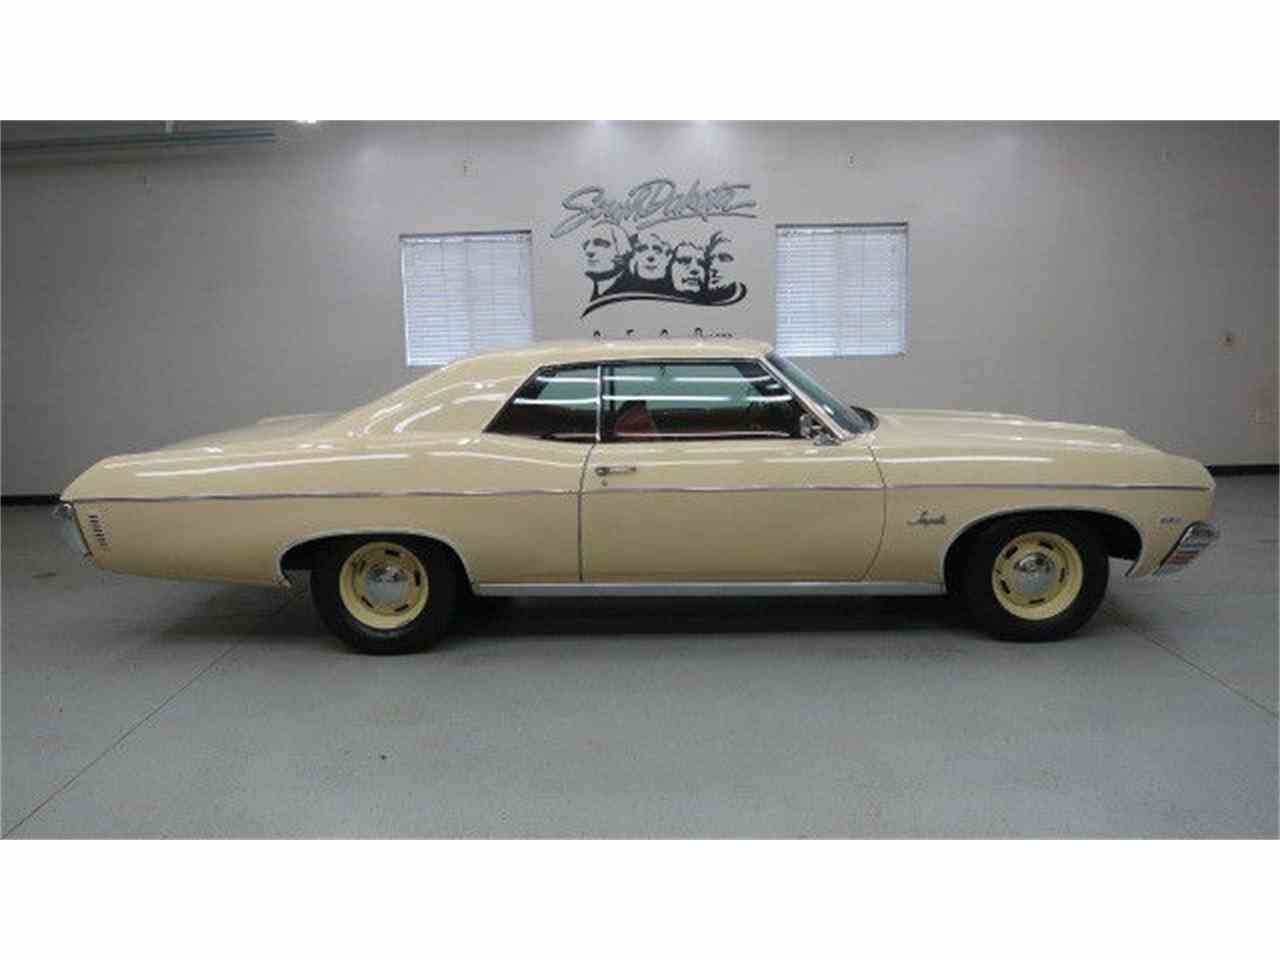 1970 chevrolet impala for sale cc 774929. Black Bedroom Furniture Sets. Home Design Ideas